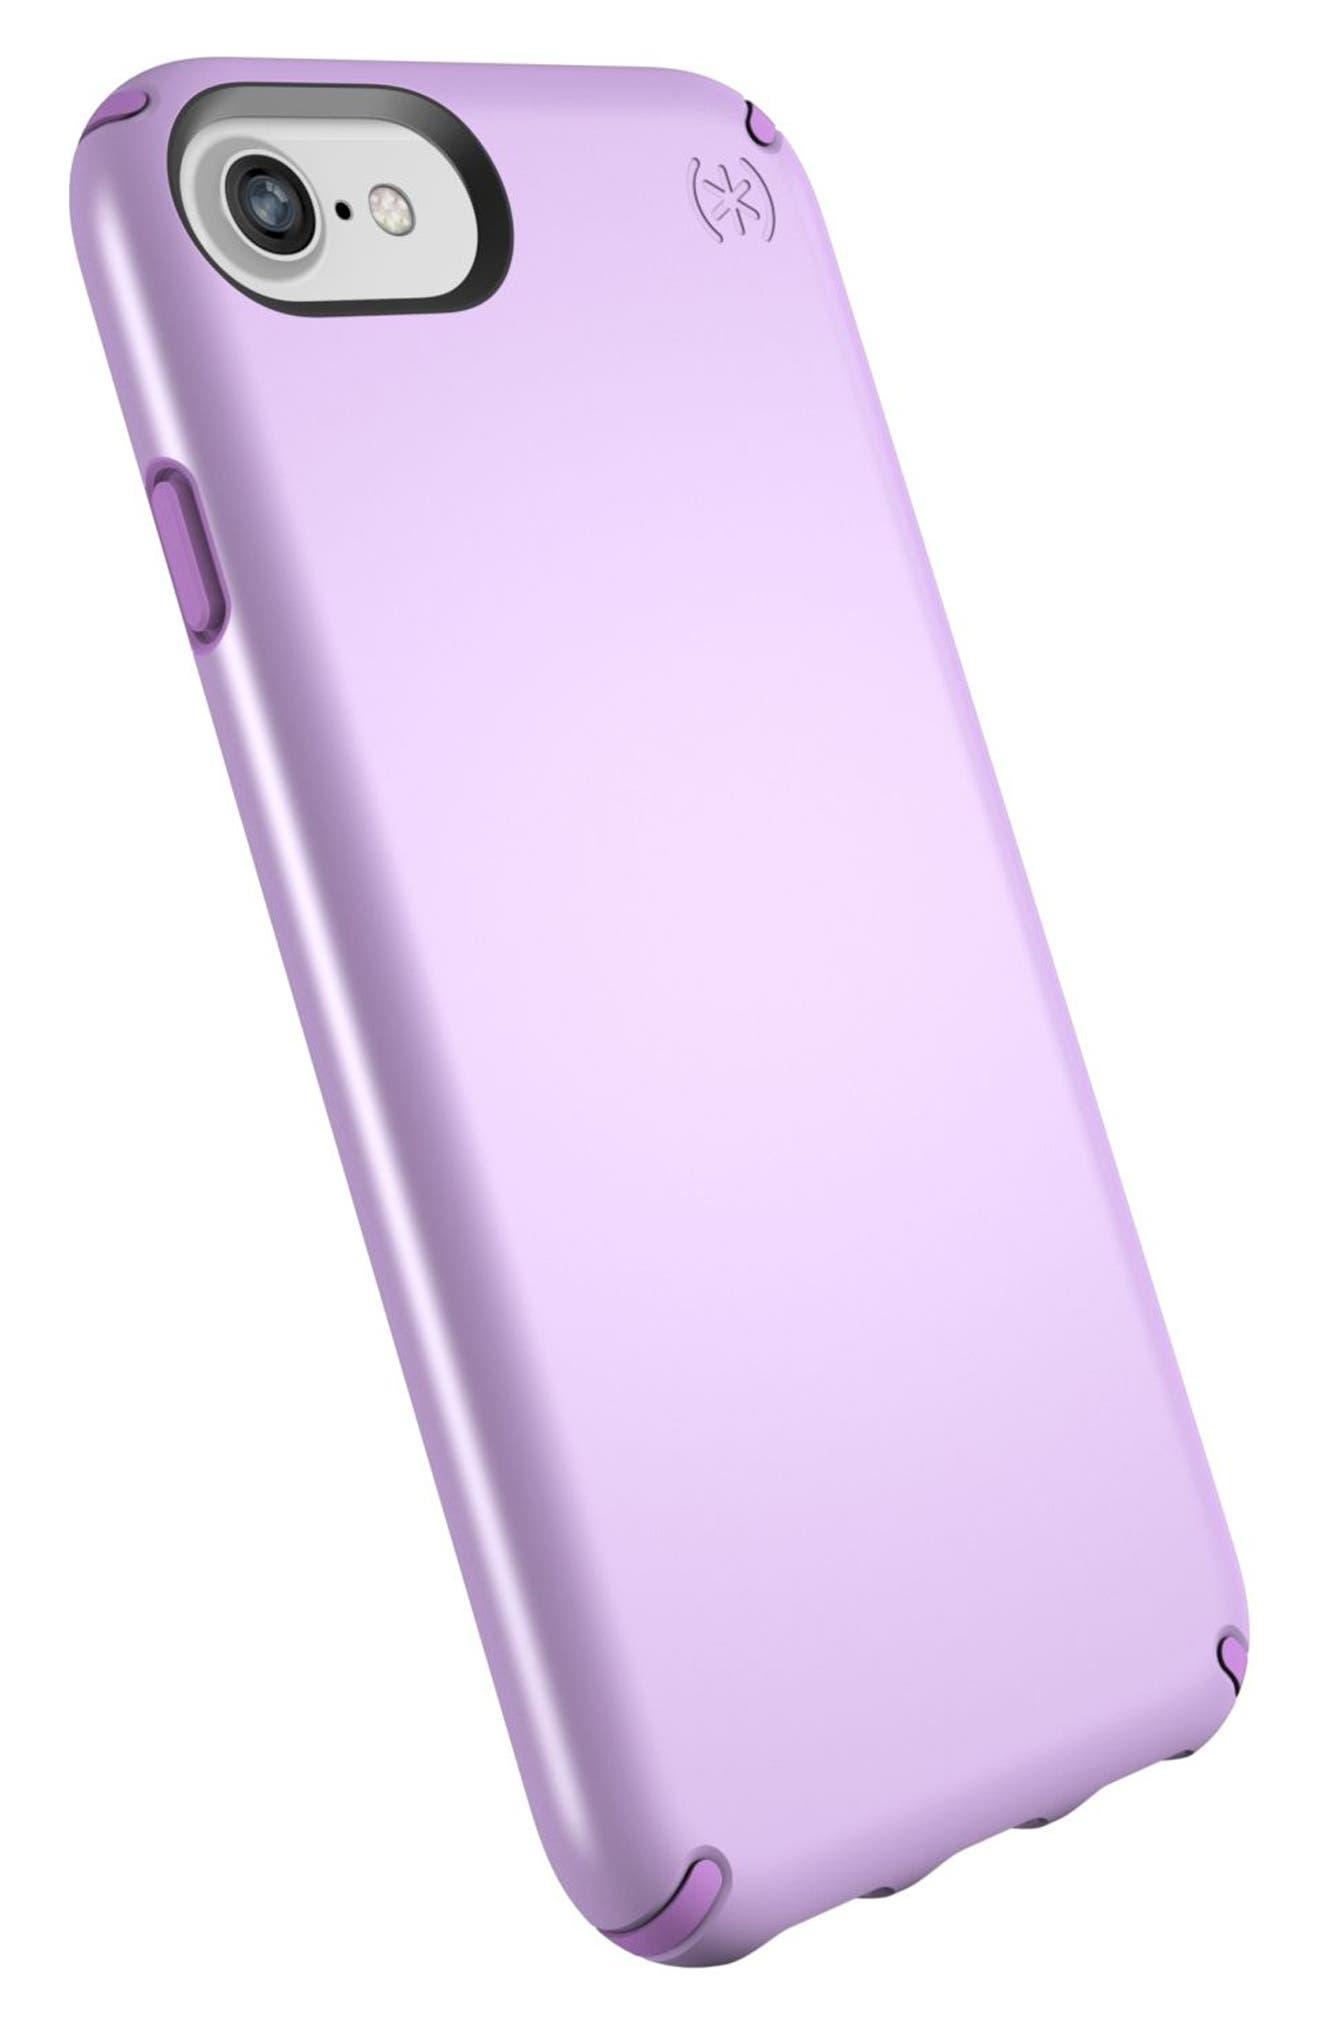 iPhone 6/6s/7/8 Case,                             Alternate thumbnail 7, color,                             Taro Purple Metallic/ Purple